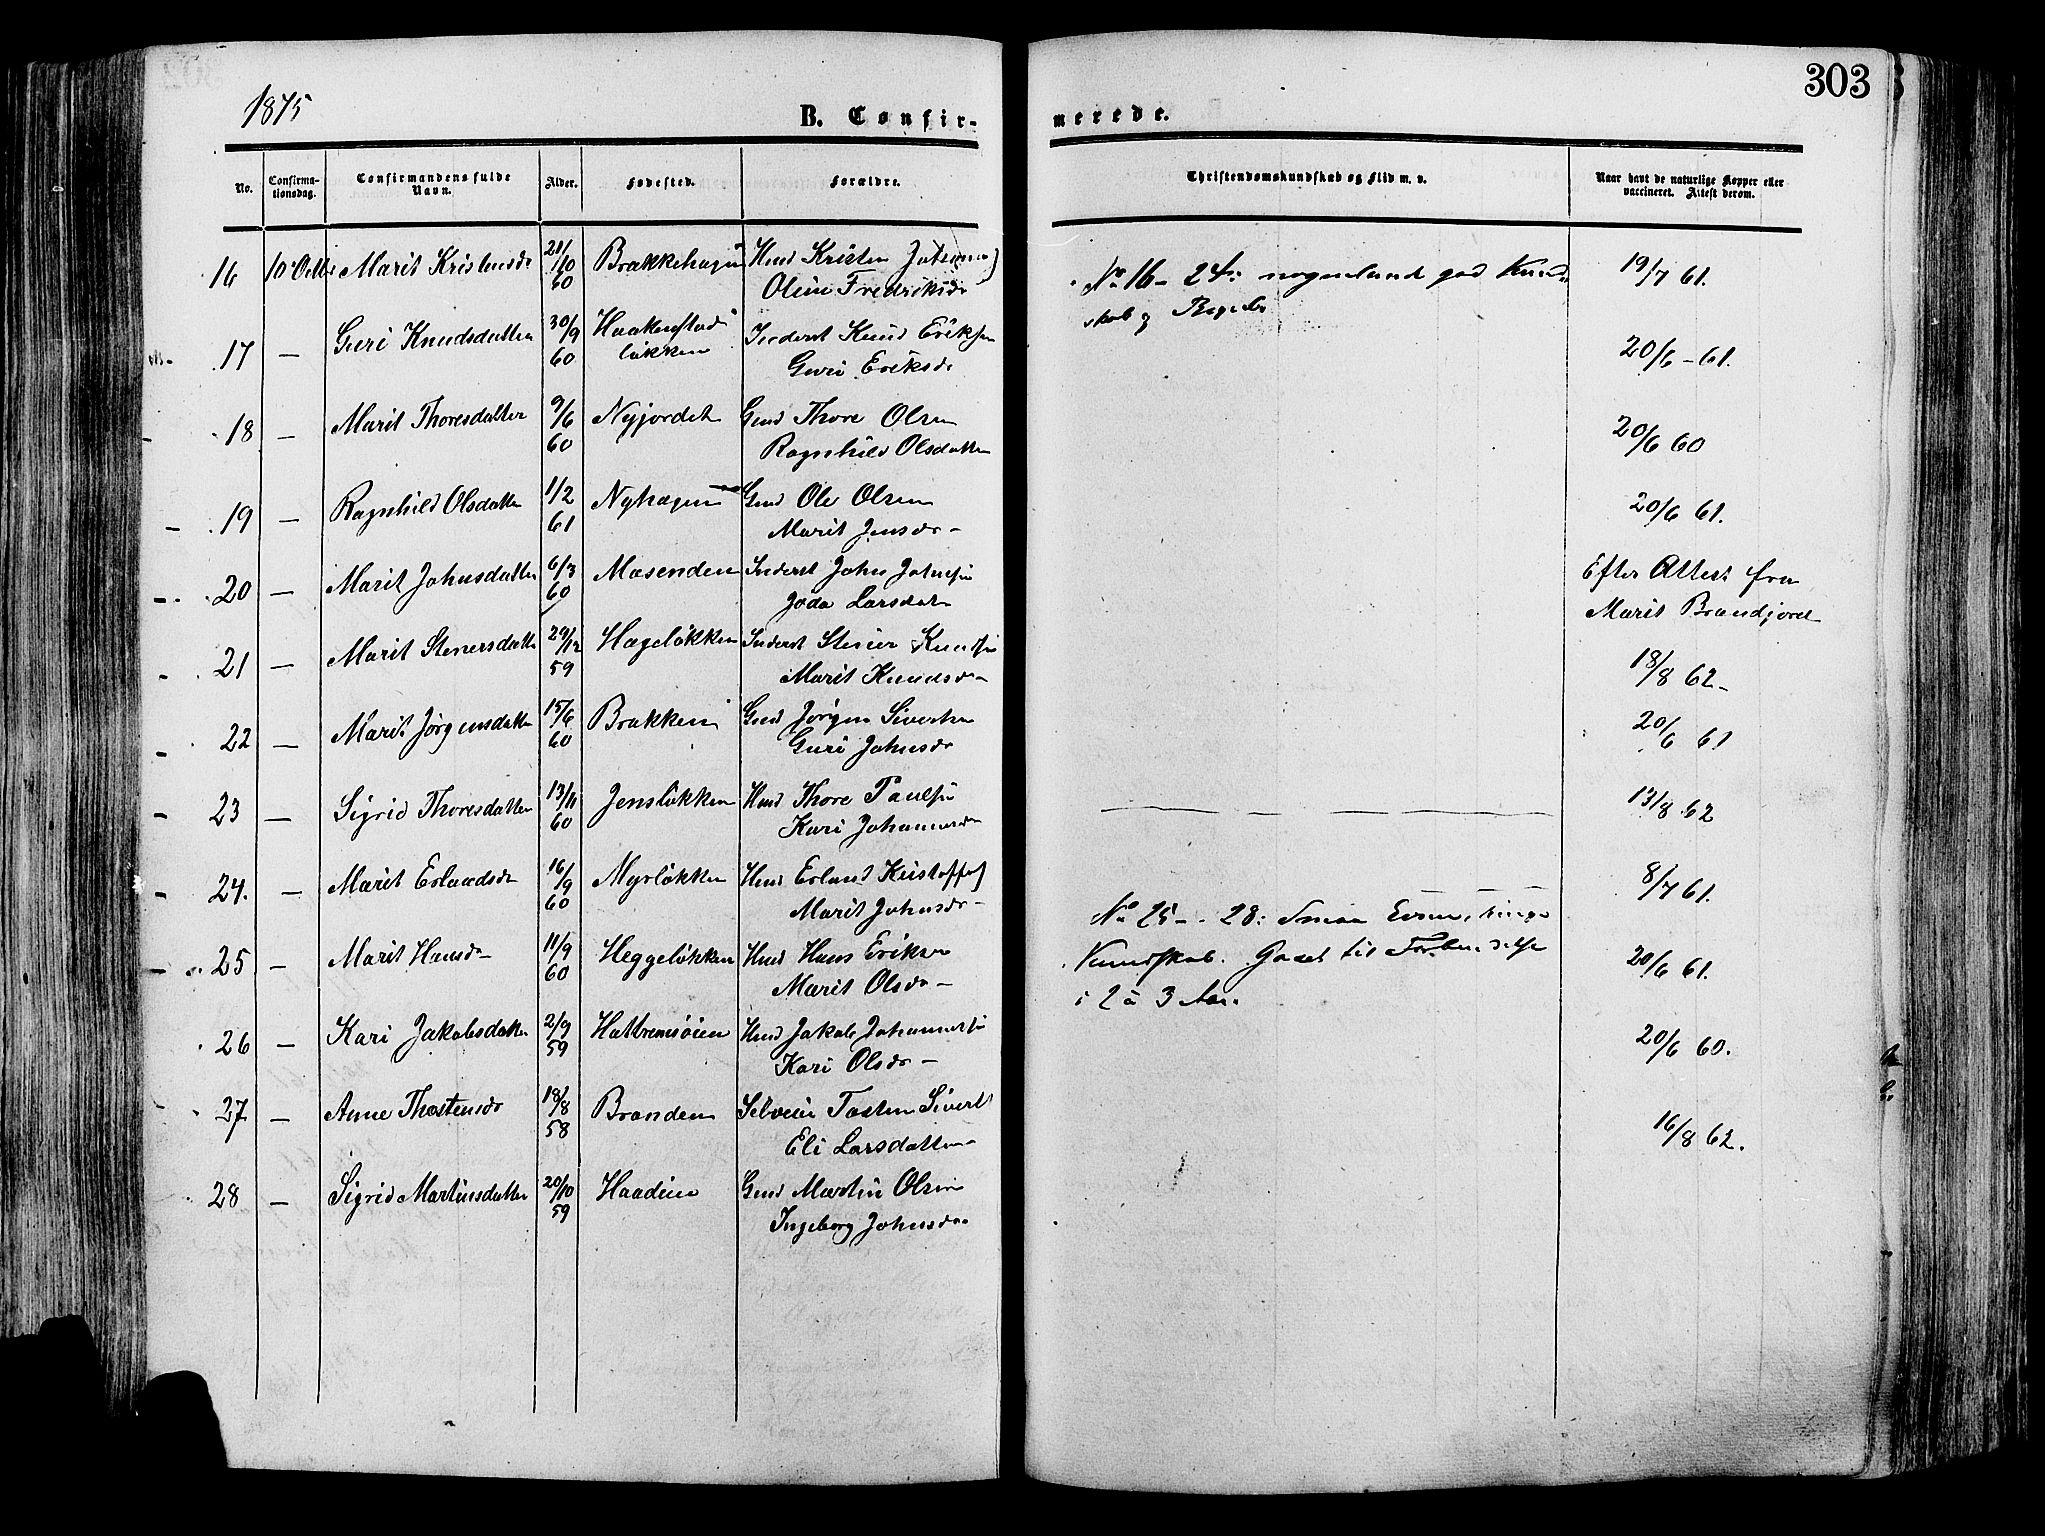 SAH, Lesja prestekontor, Ministerialbok nr. 8, 1854-1880, s. 303